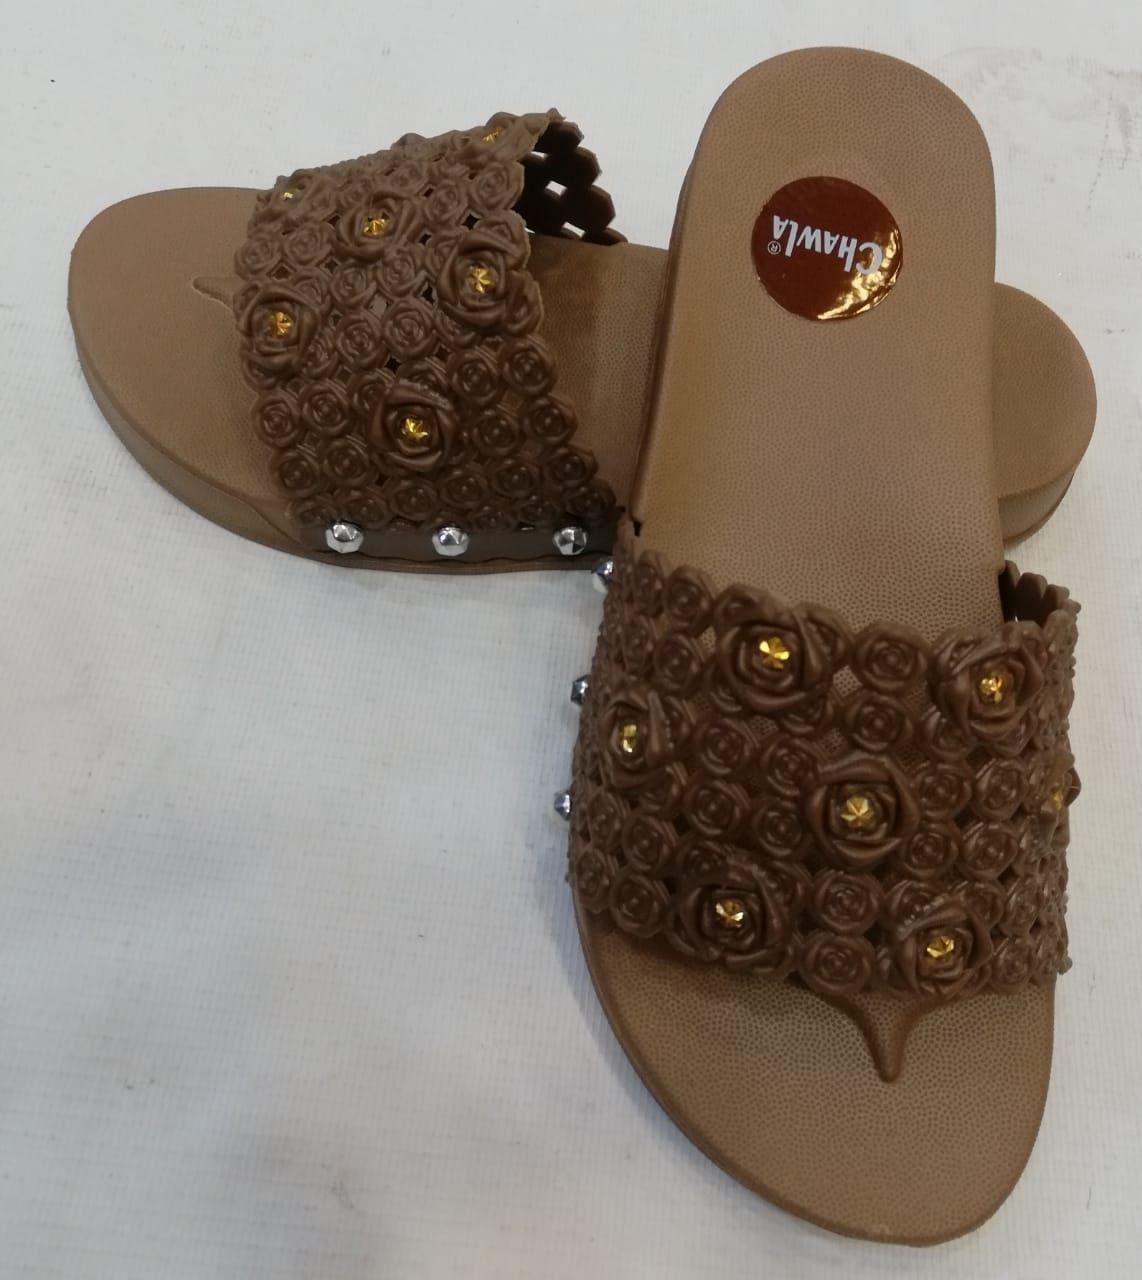 0437bc2c1 Women s Shoes - Buy Ladies Footwear Online - Daraz Pakistan